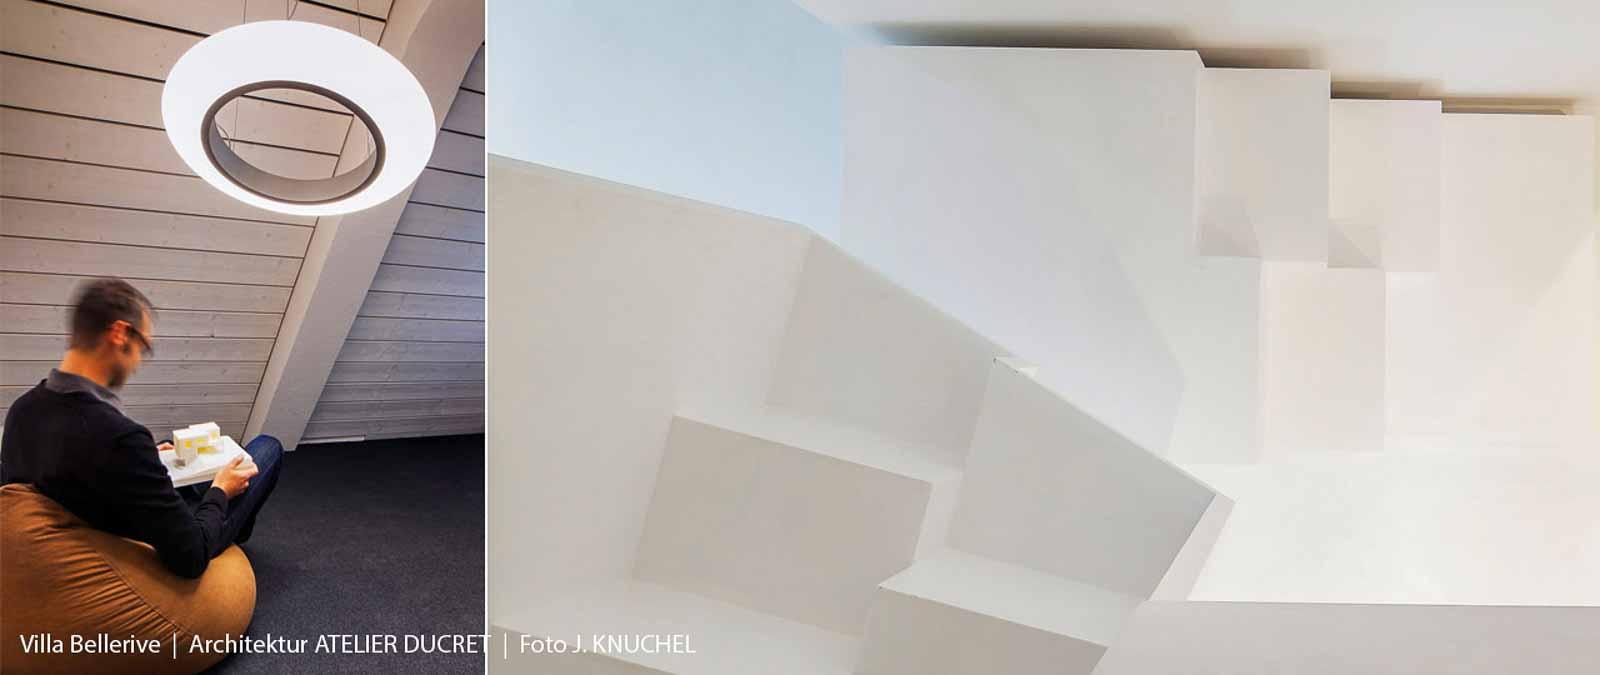 Wooddesign_Holzdesign_Treppe_Holztreppe_schwebend_2-teilig_atelierducret_freiburg(6)